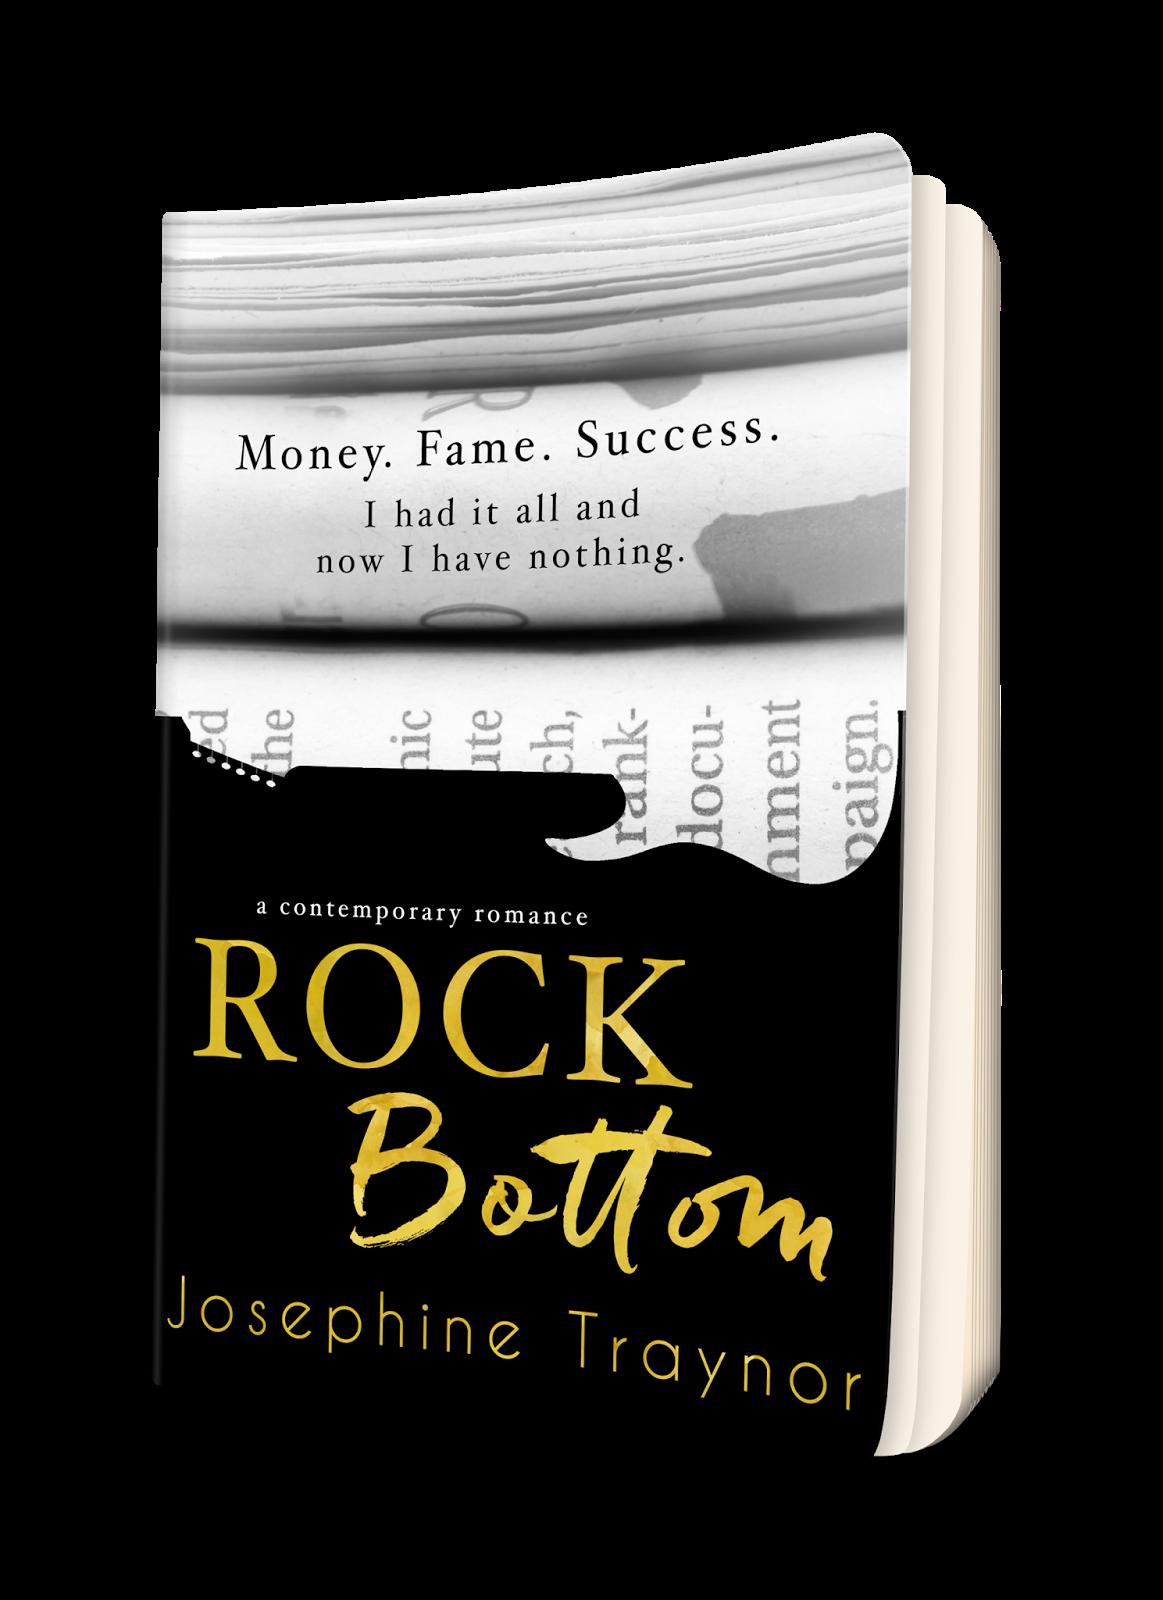 Rock bottom blog